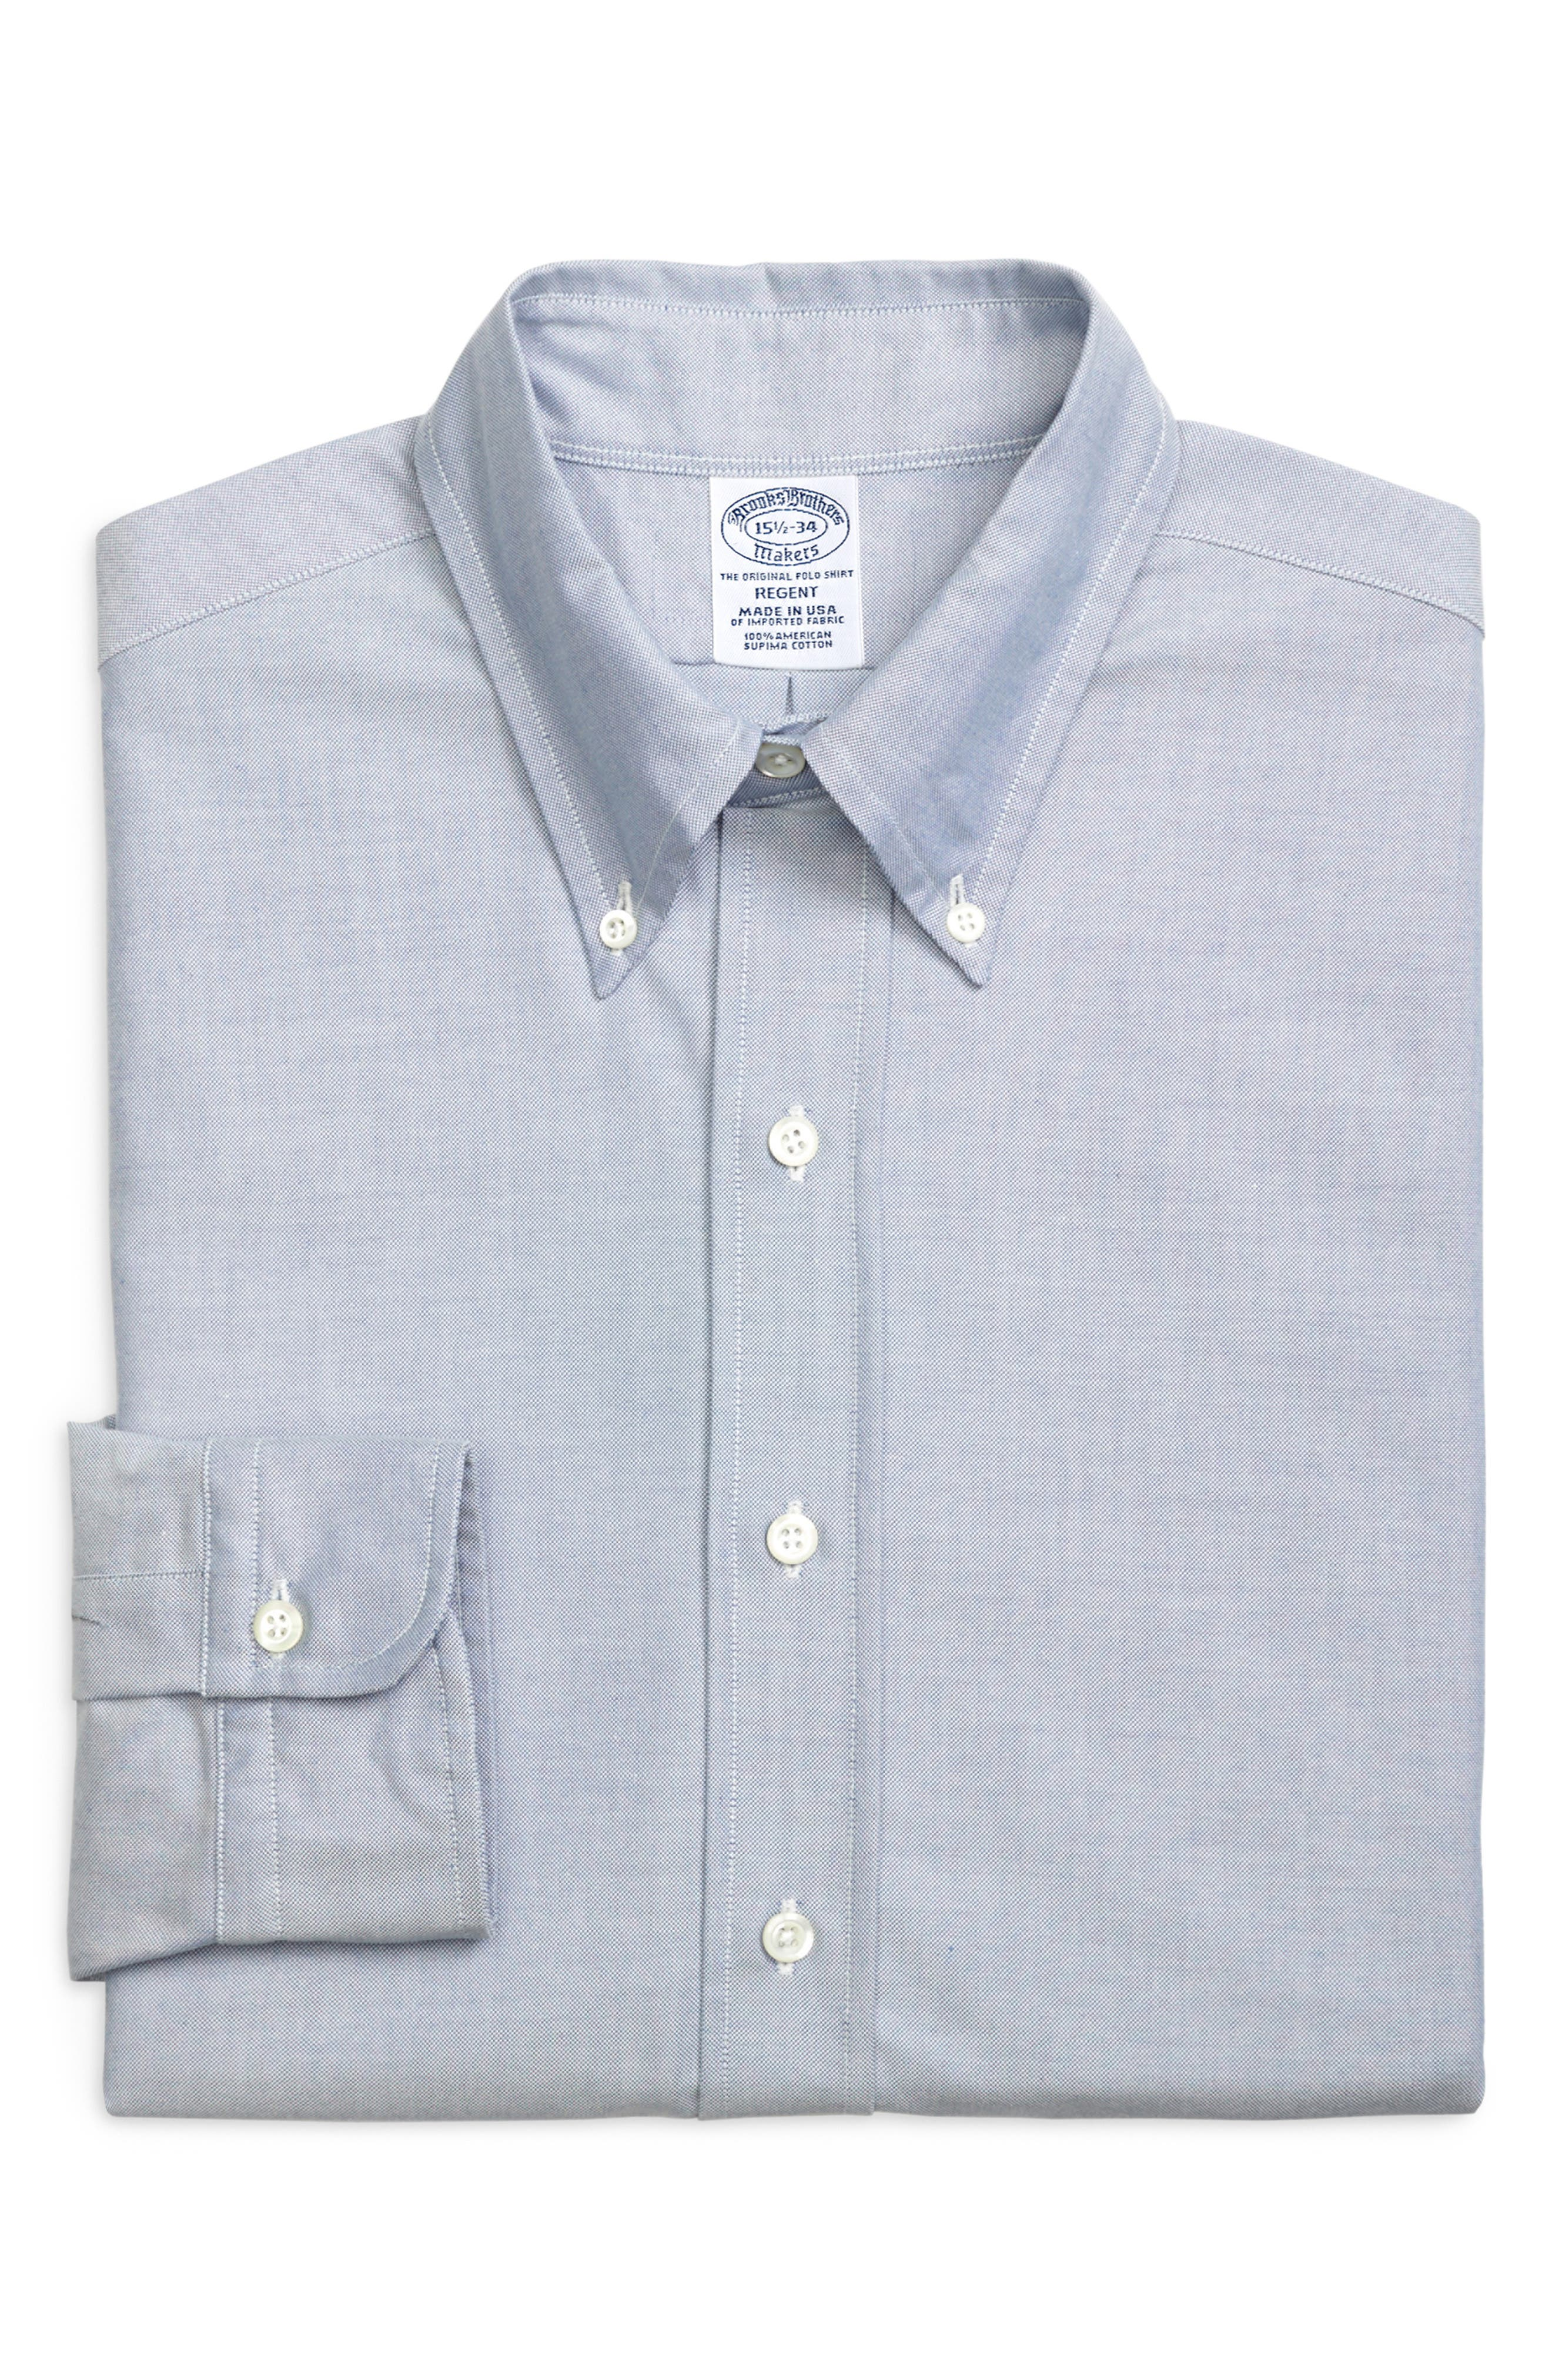 Regent Regular Fit Solid Dress Shirt